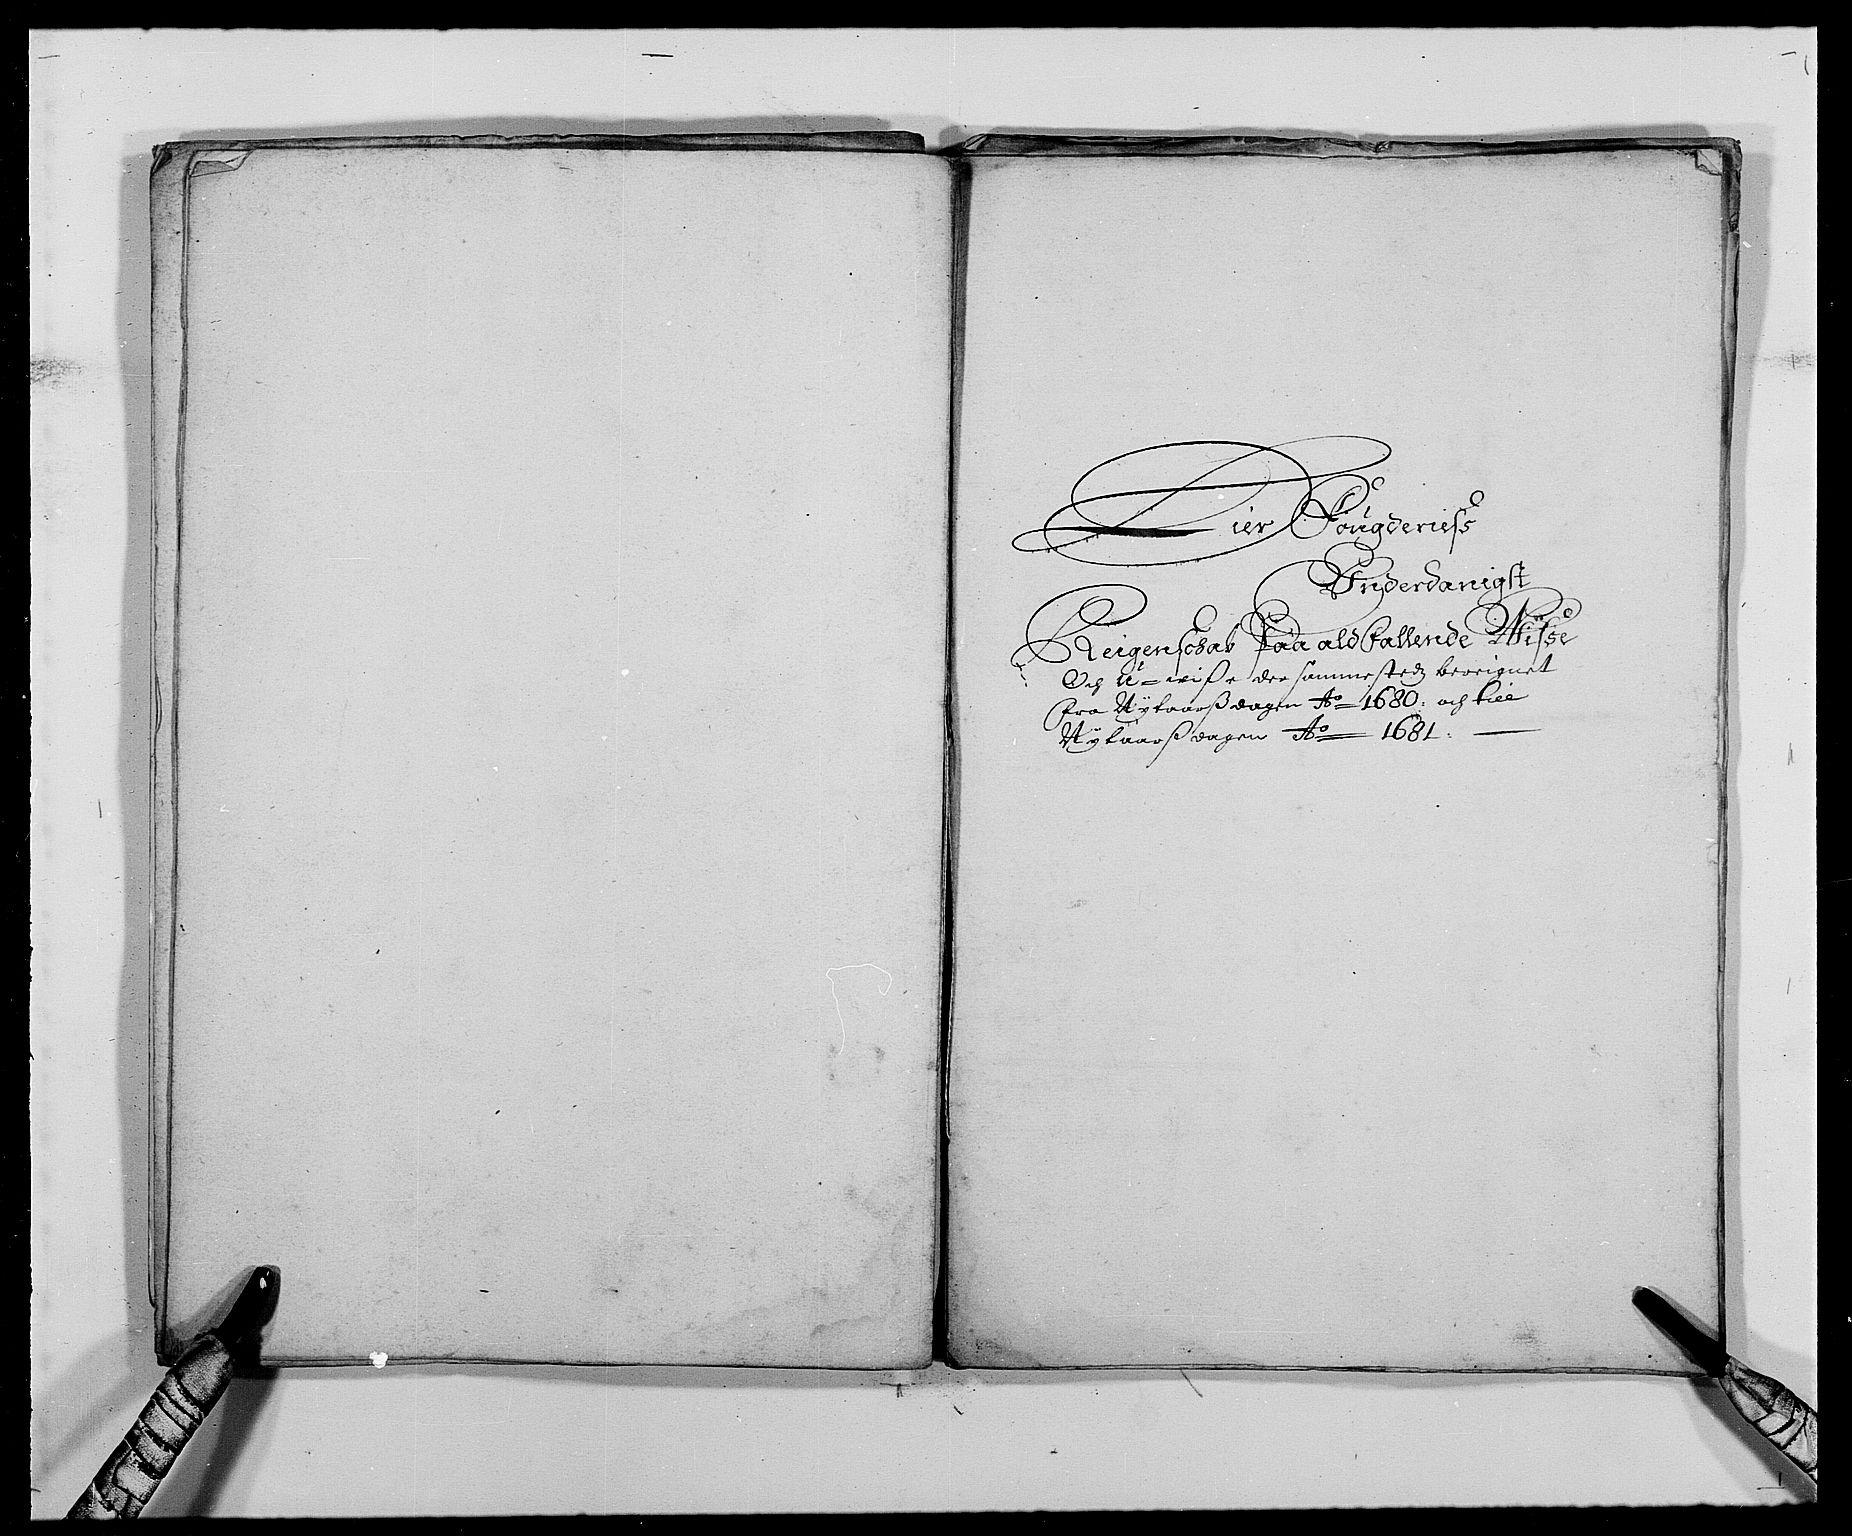 RA, Rentekammeret inntil 1814, Reviderte regnskaper, Fogderegnskap, R27/L1687: Fogderegnskap Lier, 1678-1686, s. 309